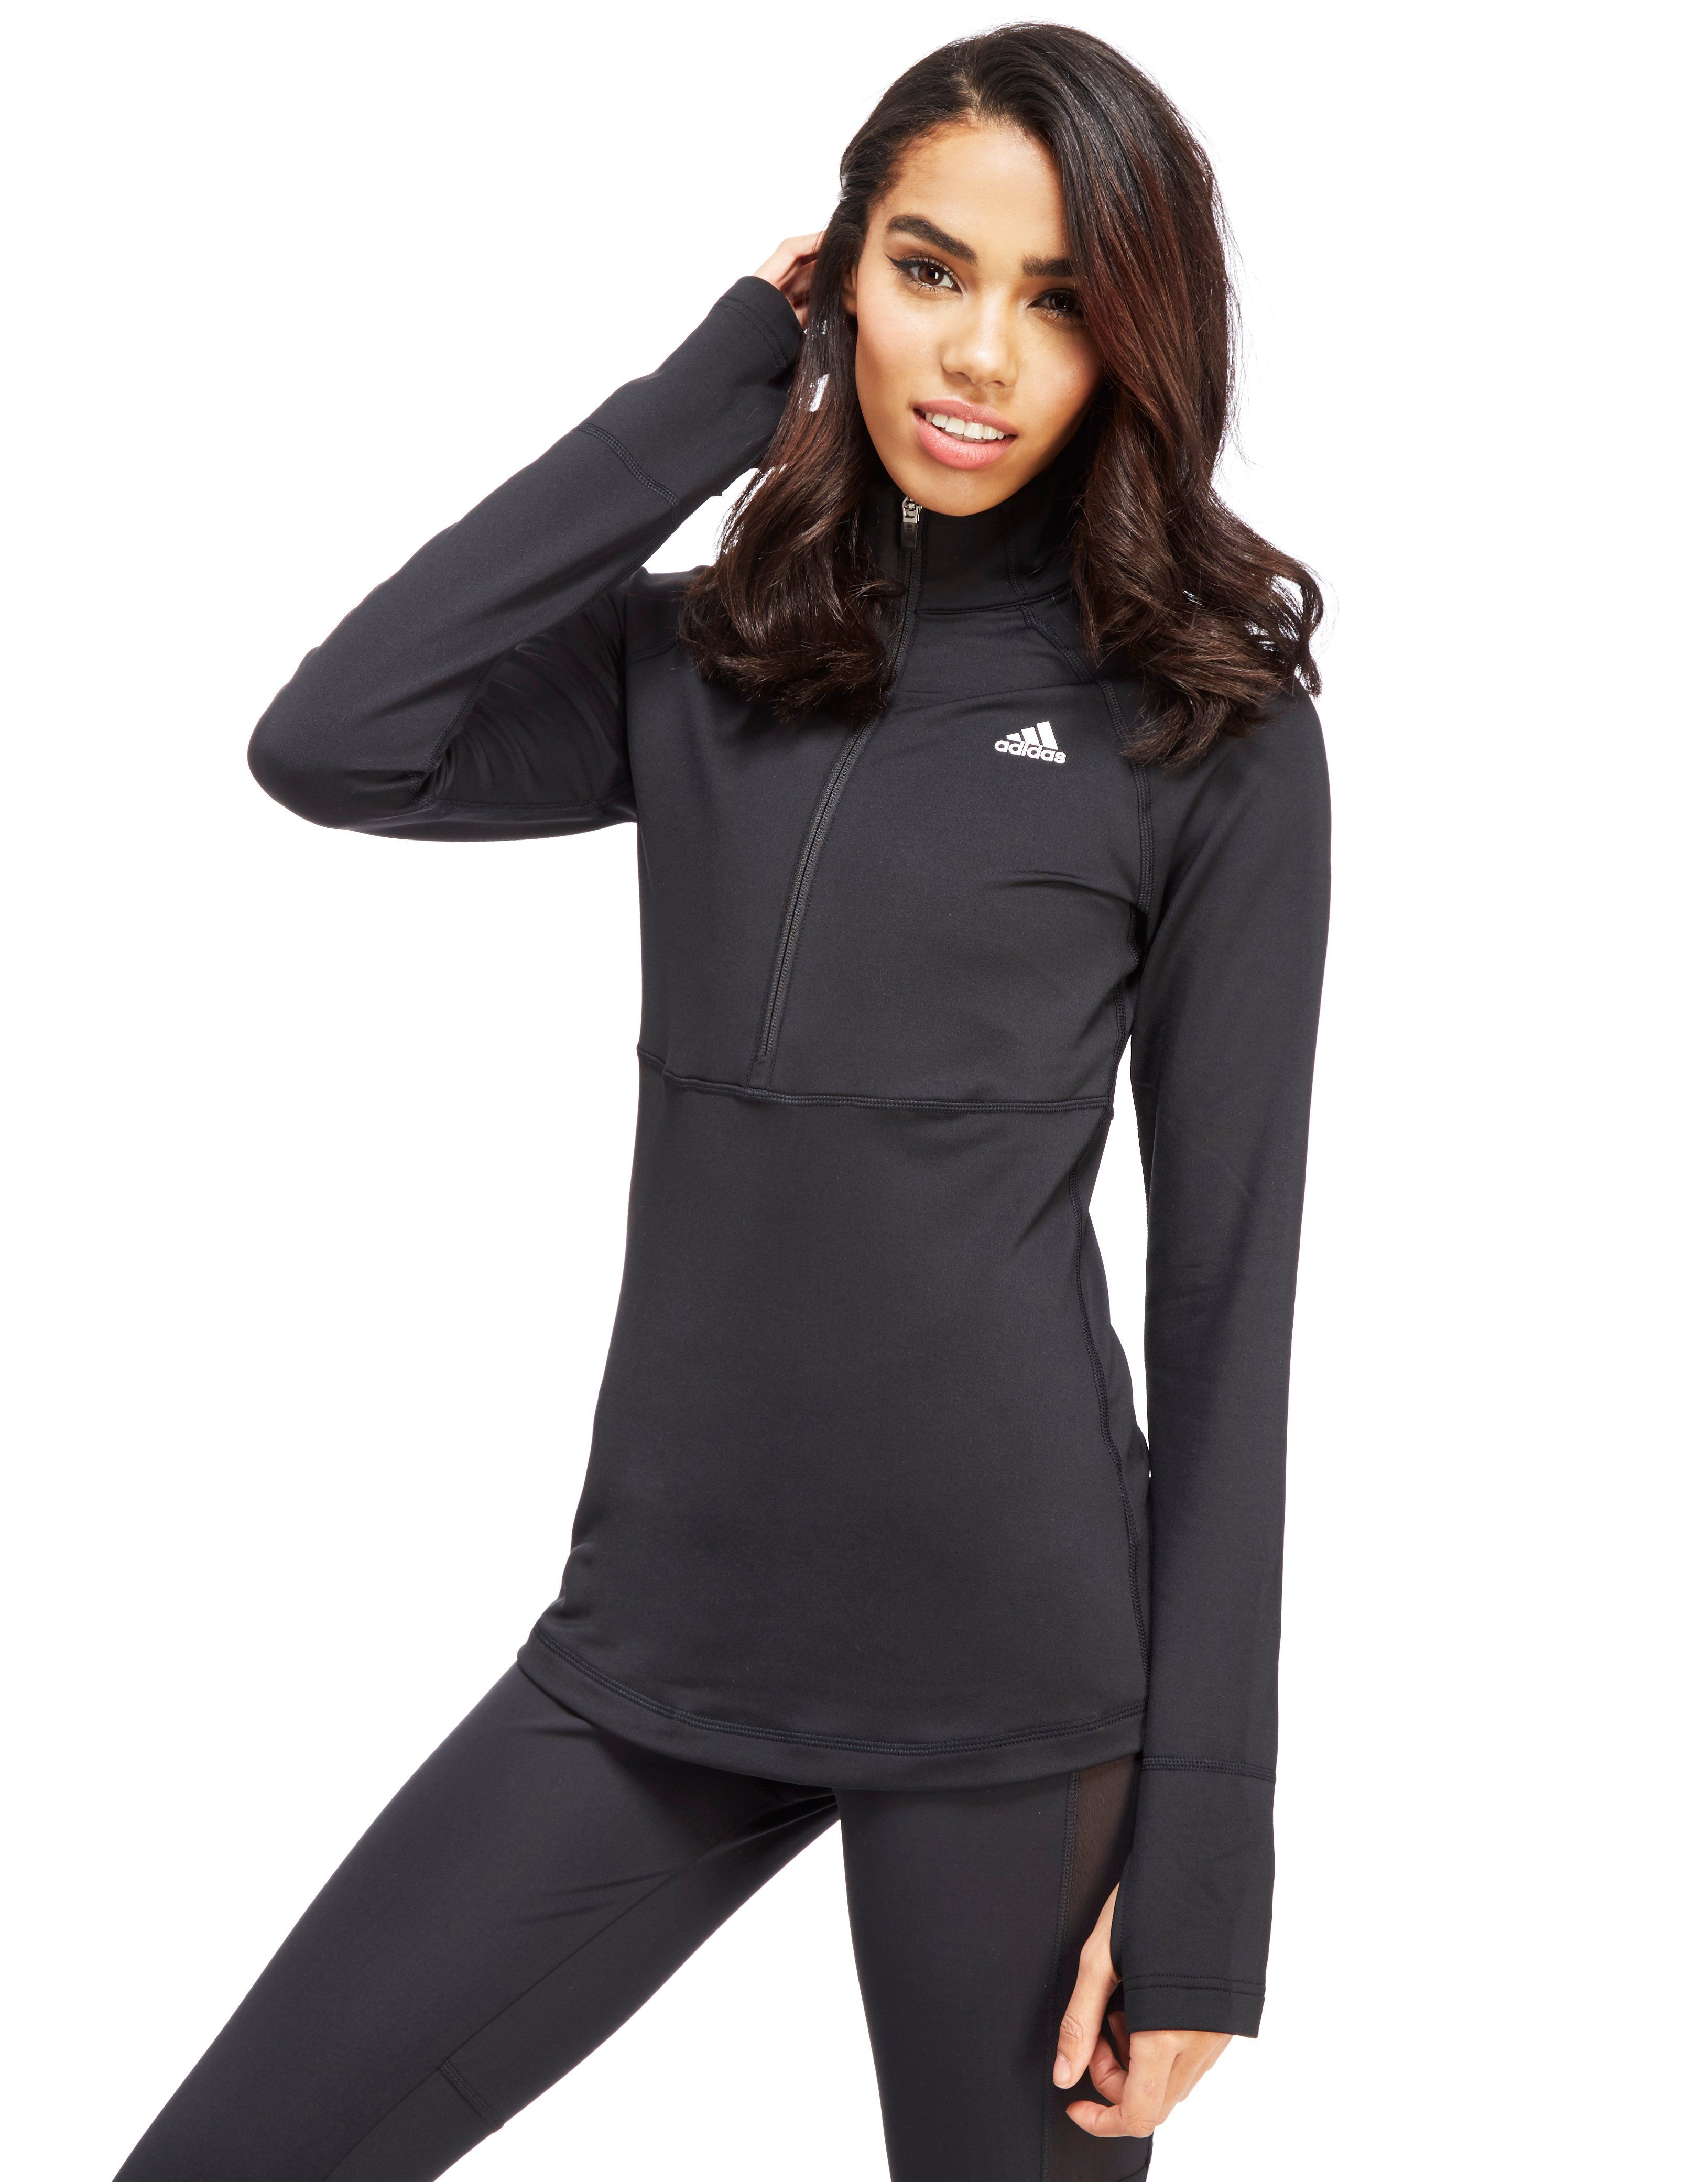 59860d7d1c Jd Sports Womens Vest Tops